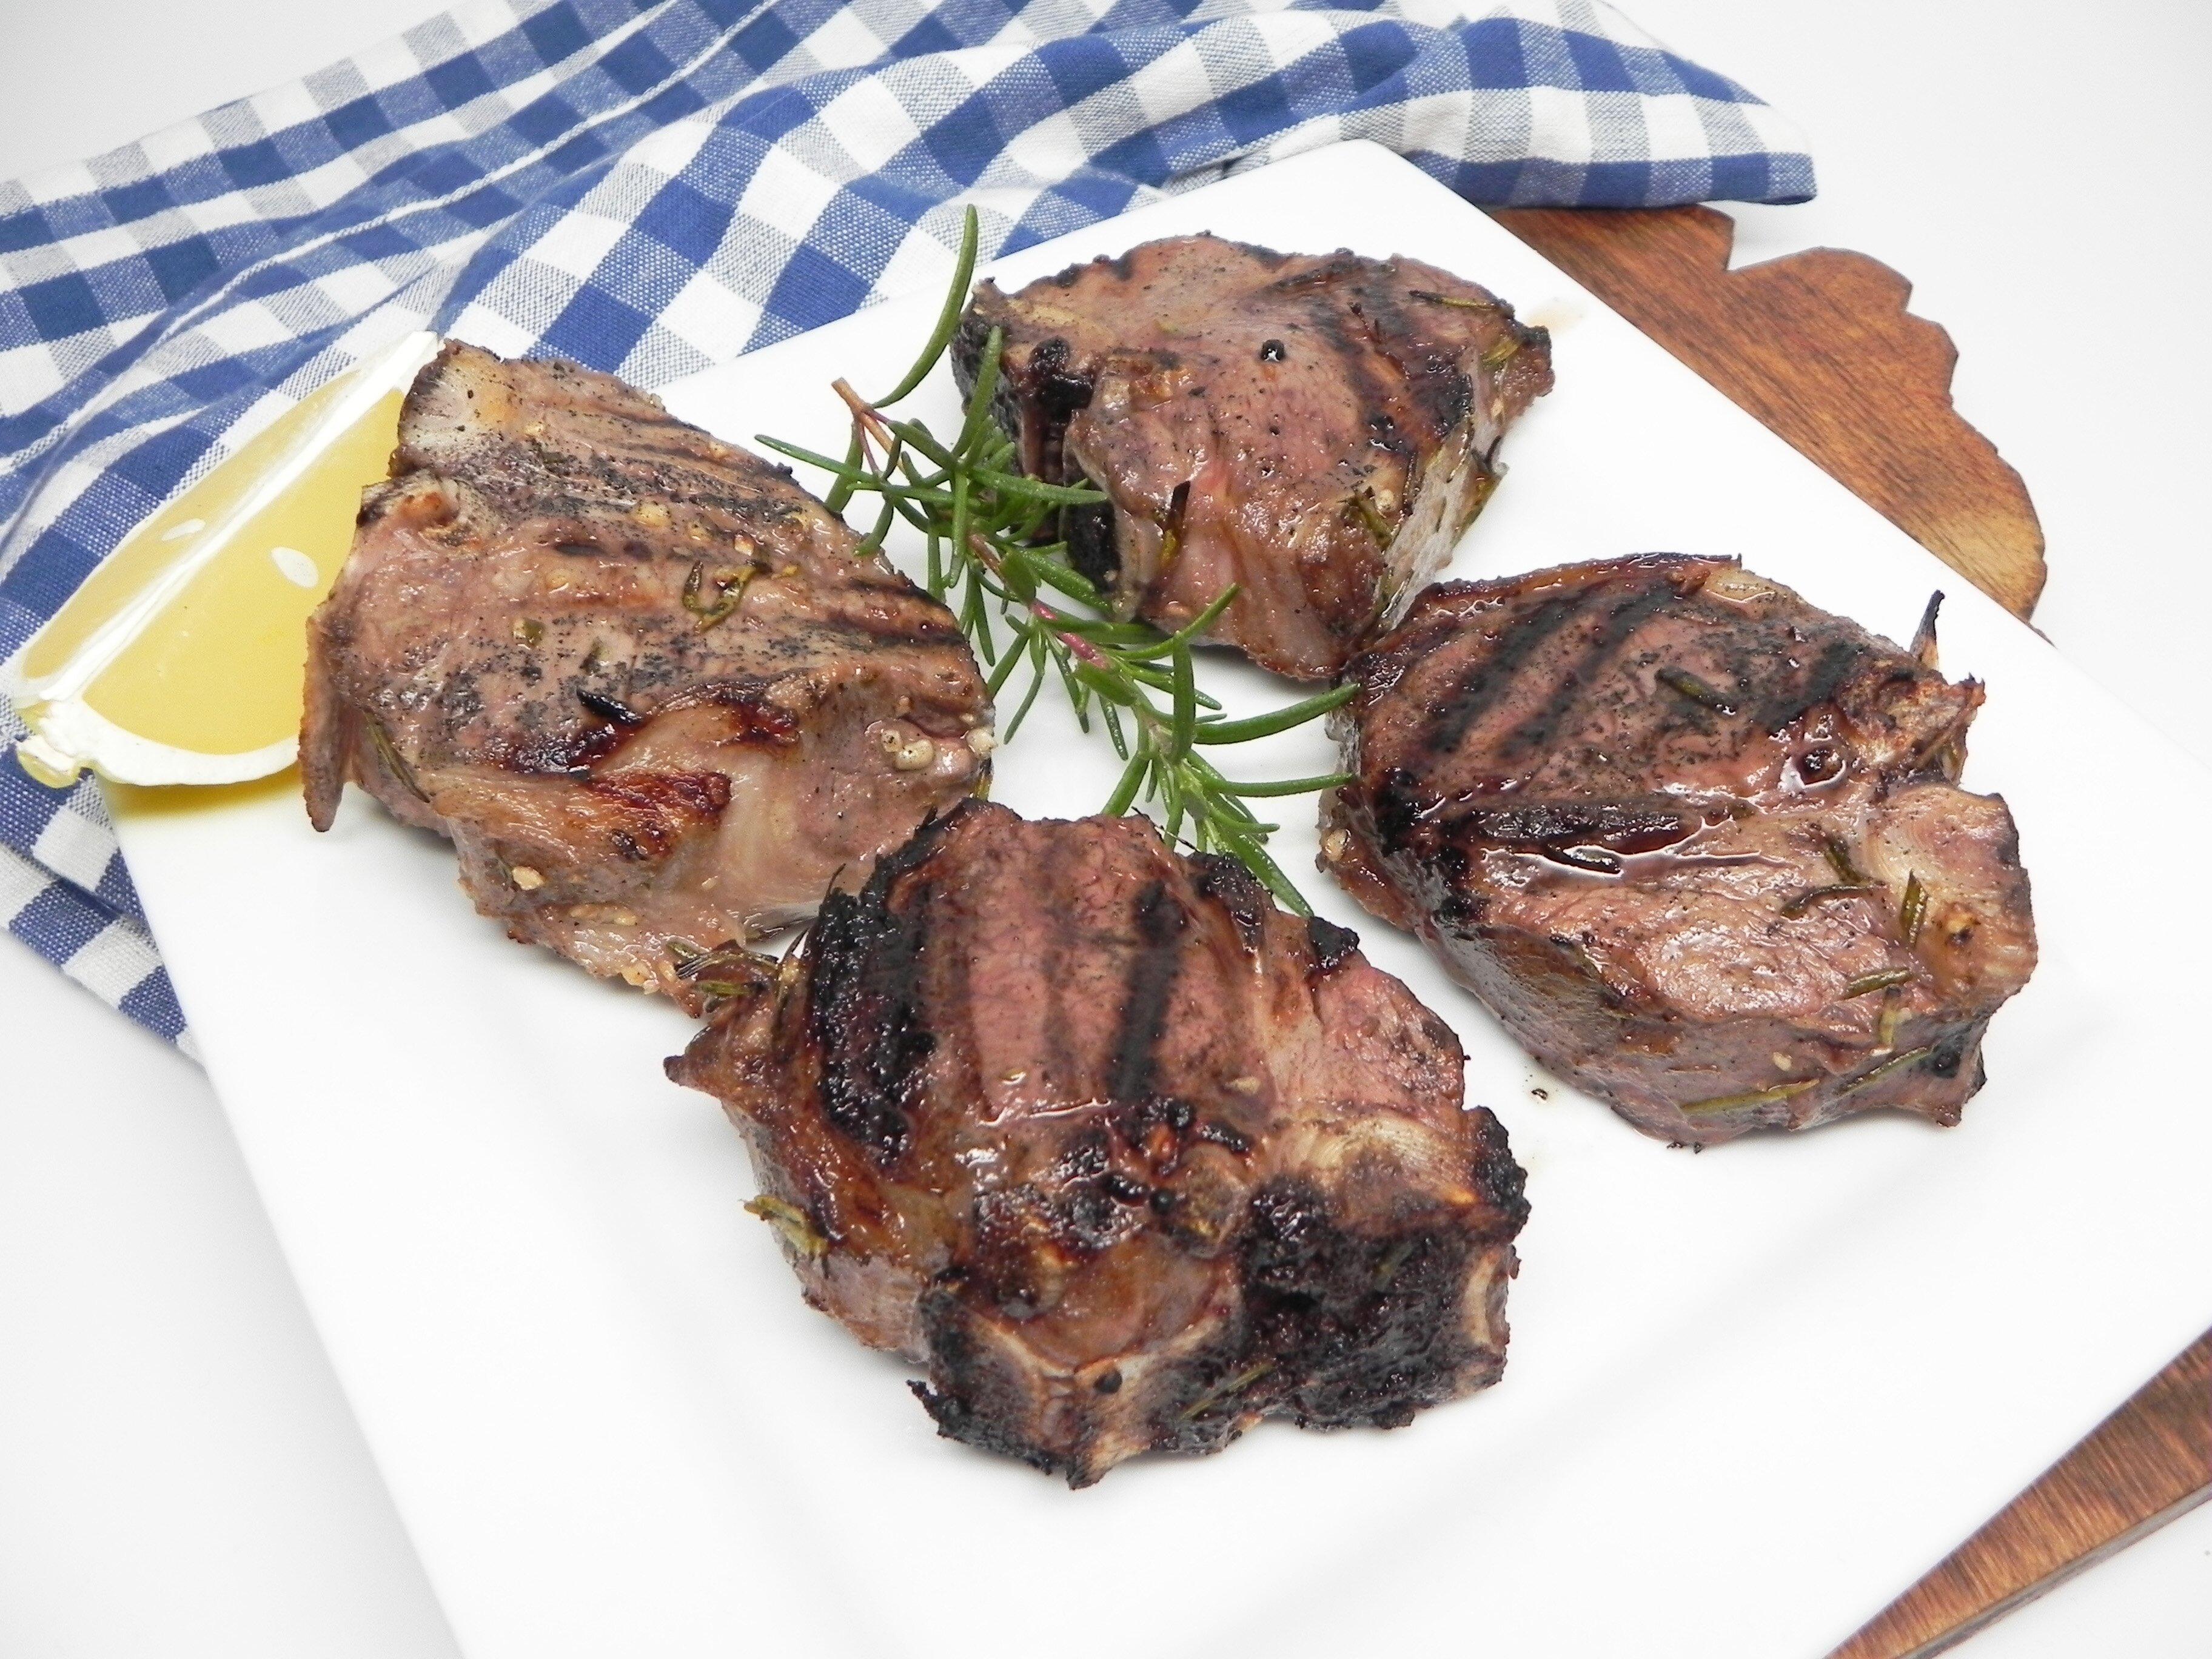 grilled garlic and rosemary lamb loin chops